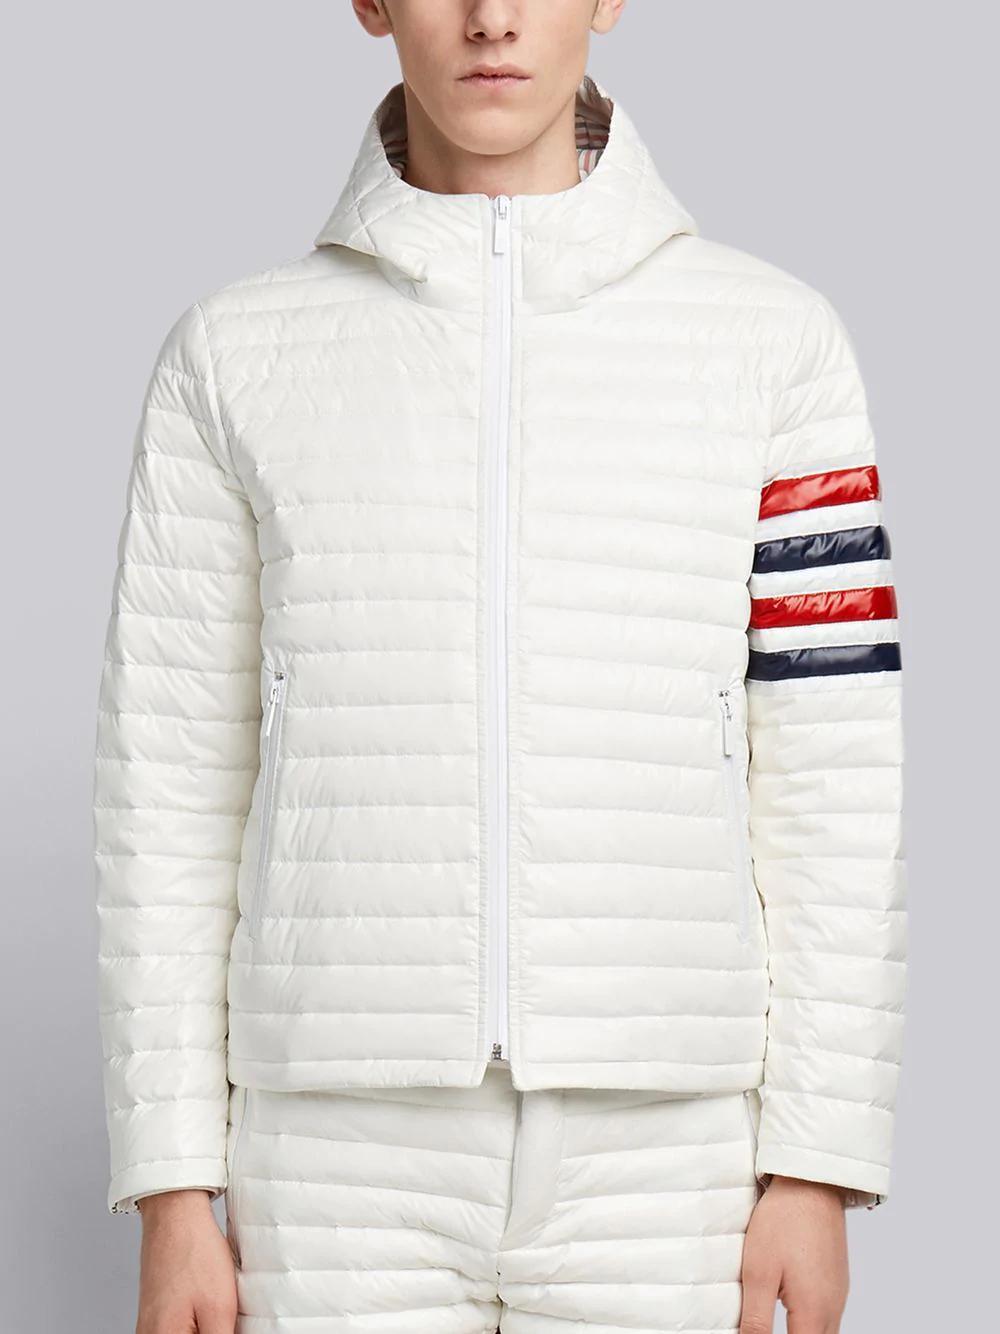 Thom Browne 4 In White